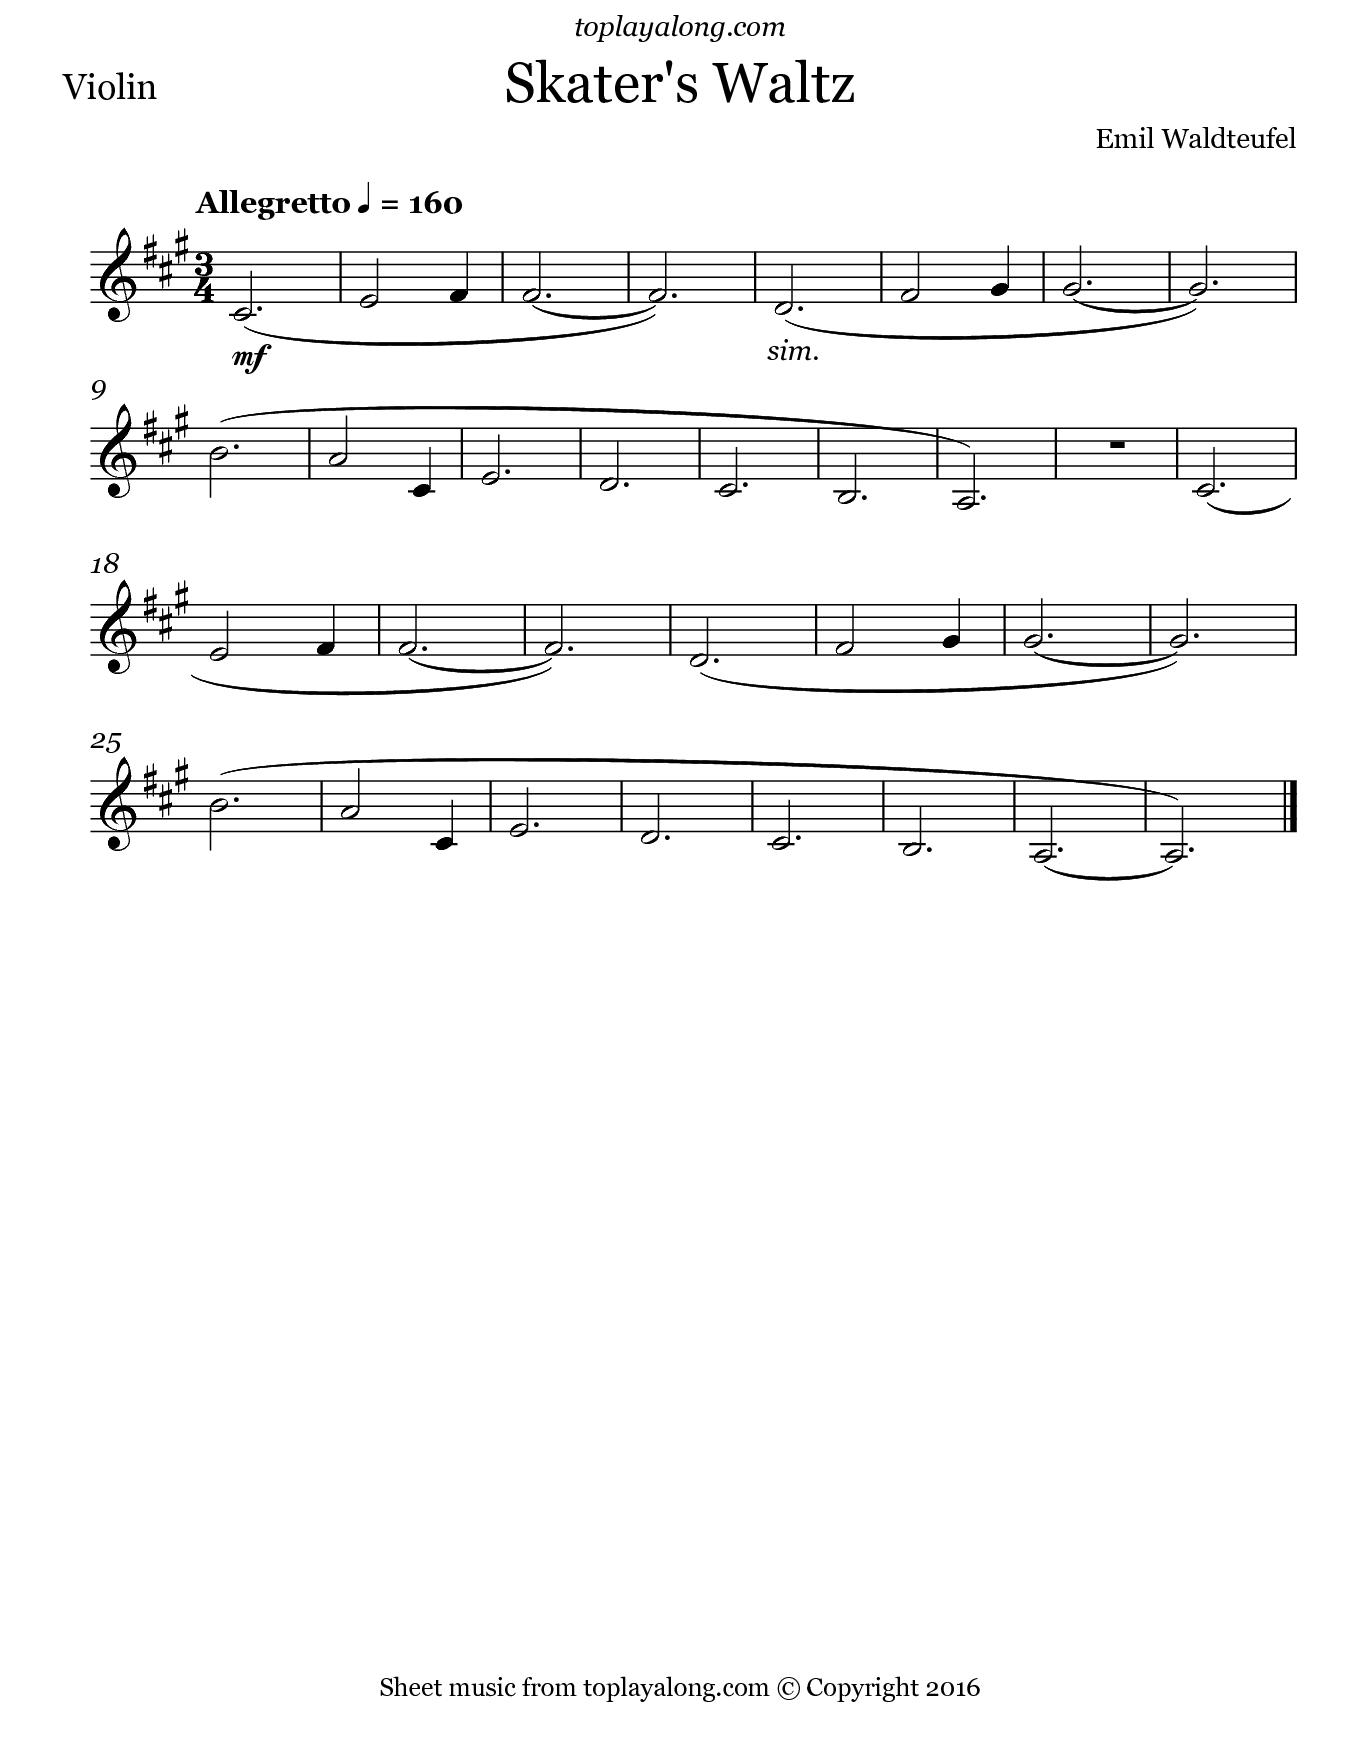 Waltz Violin Skaters Music Sheet